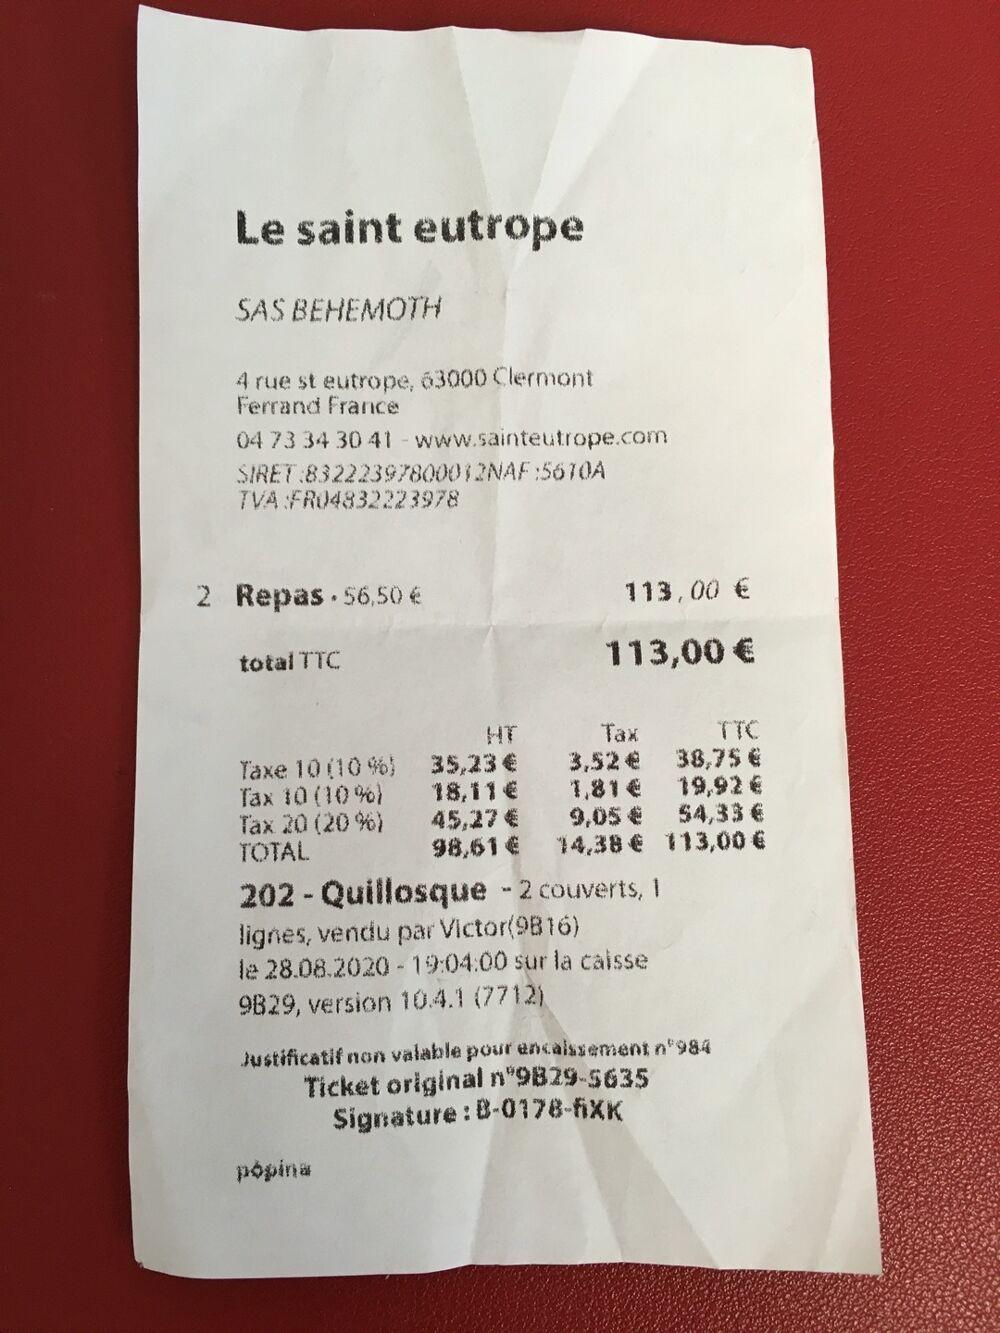 16_44_19_962_63_Le_saint_eutrope.jpg